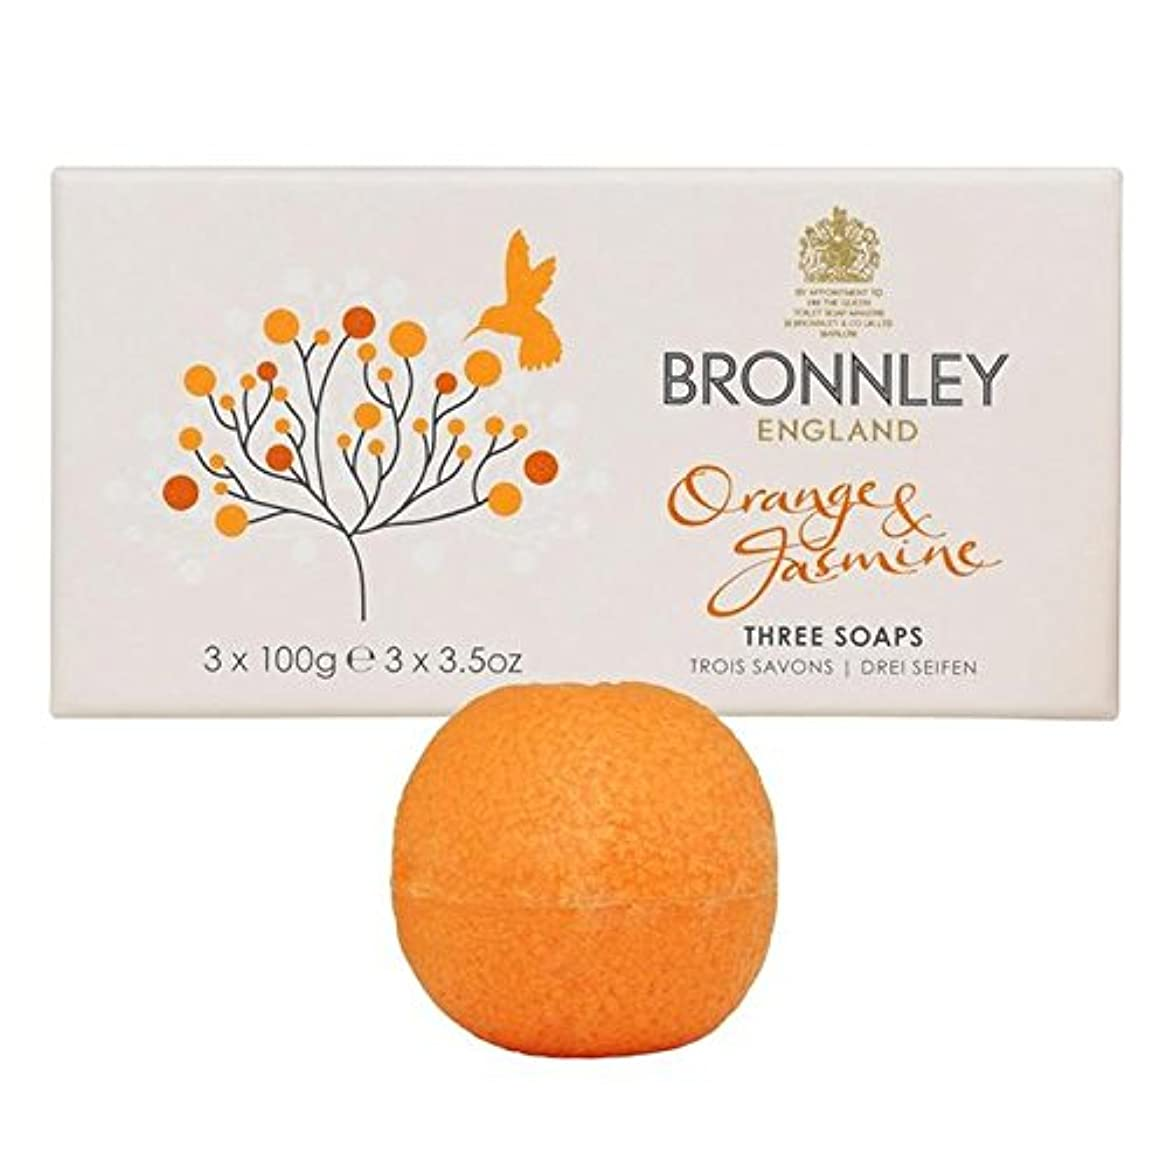 Bronnley Orange & Jasmine Soaps 3 x 100g (Pack of 6) - オレンジ&ジャスミン石鹸3×100グラム x6 [並行輸入品]